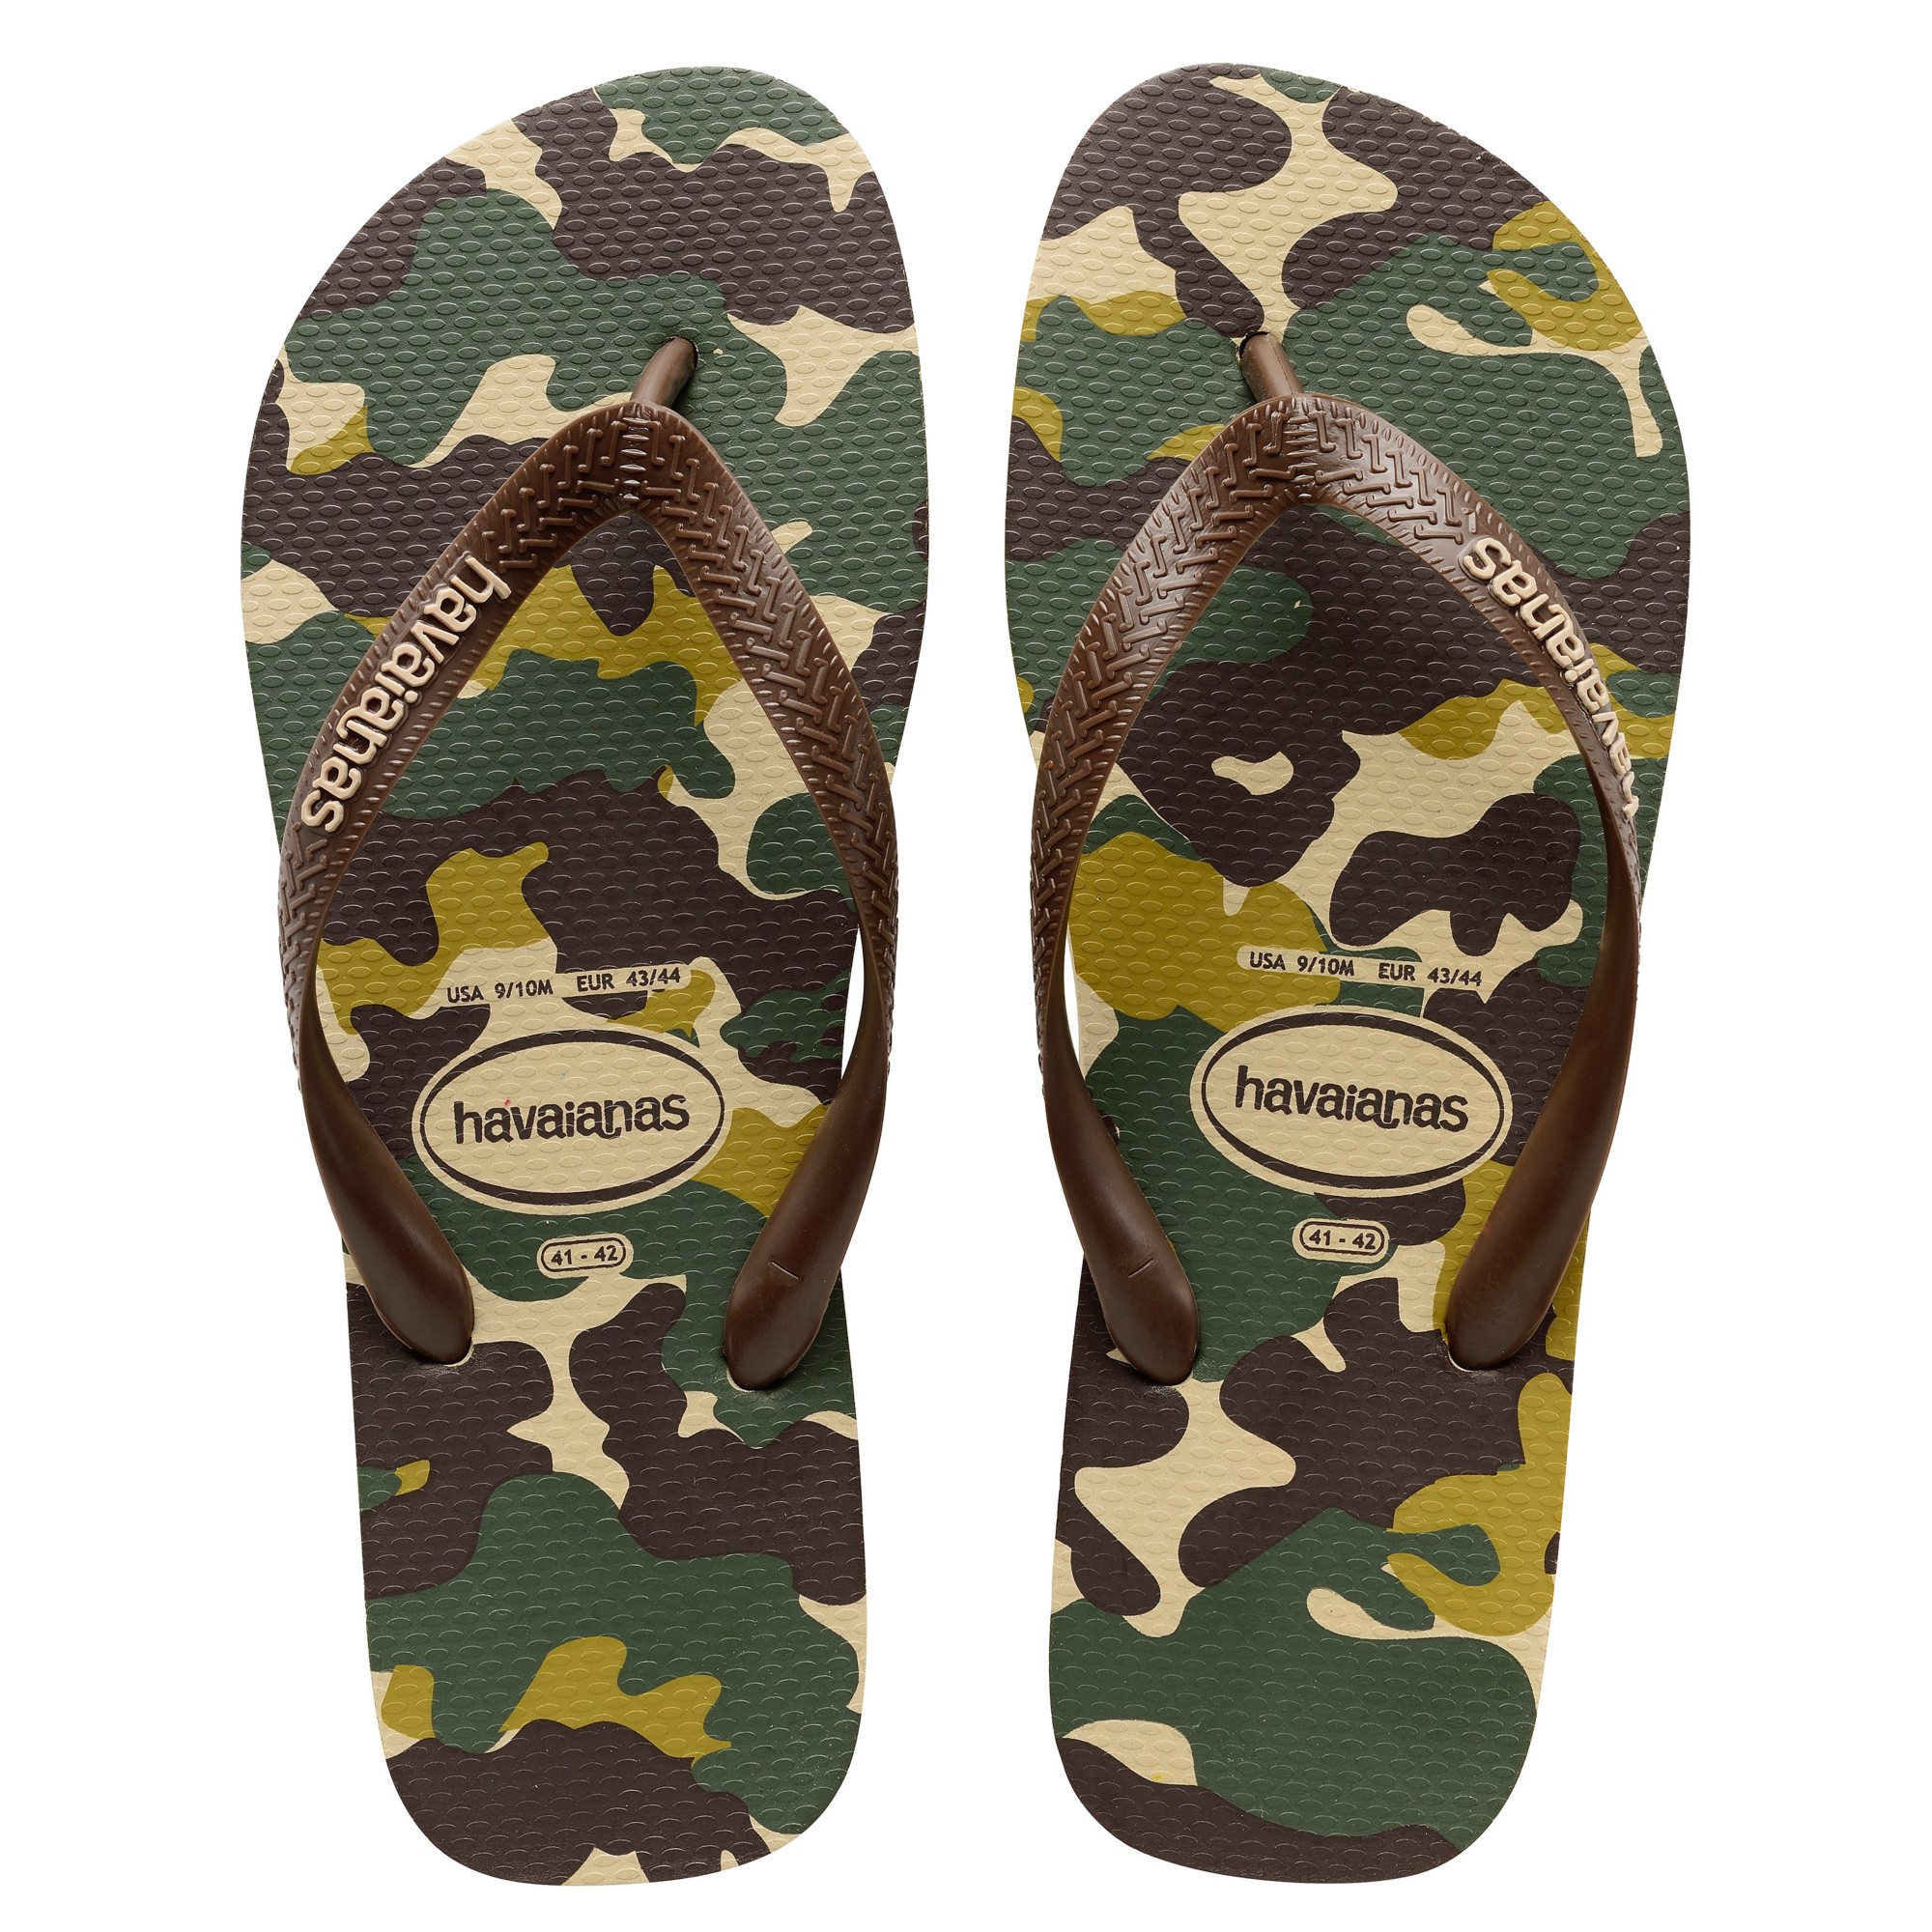 e11838165545 Havaianas Camouflage Patterned Flip Flops in Green for Men - Lyst